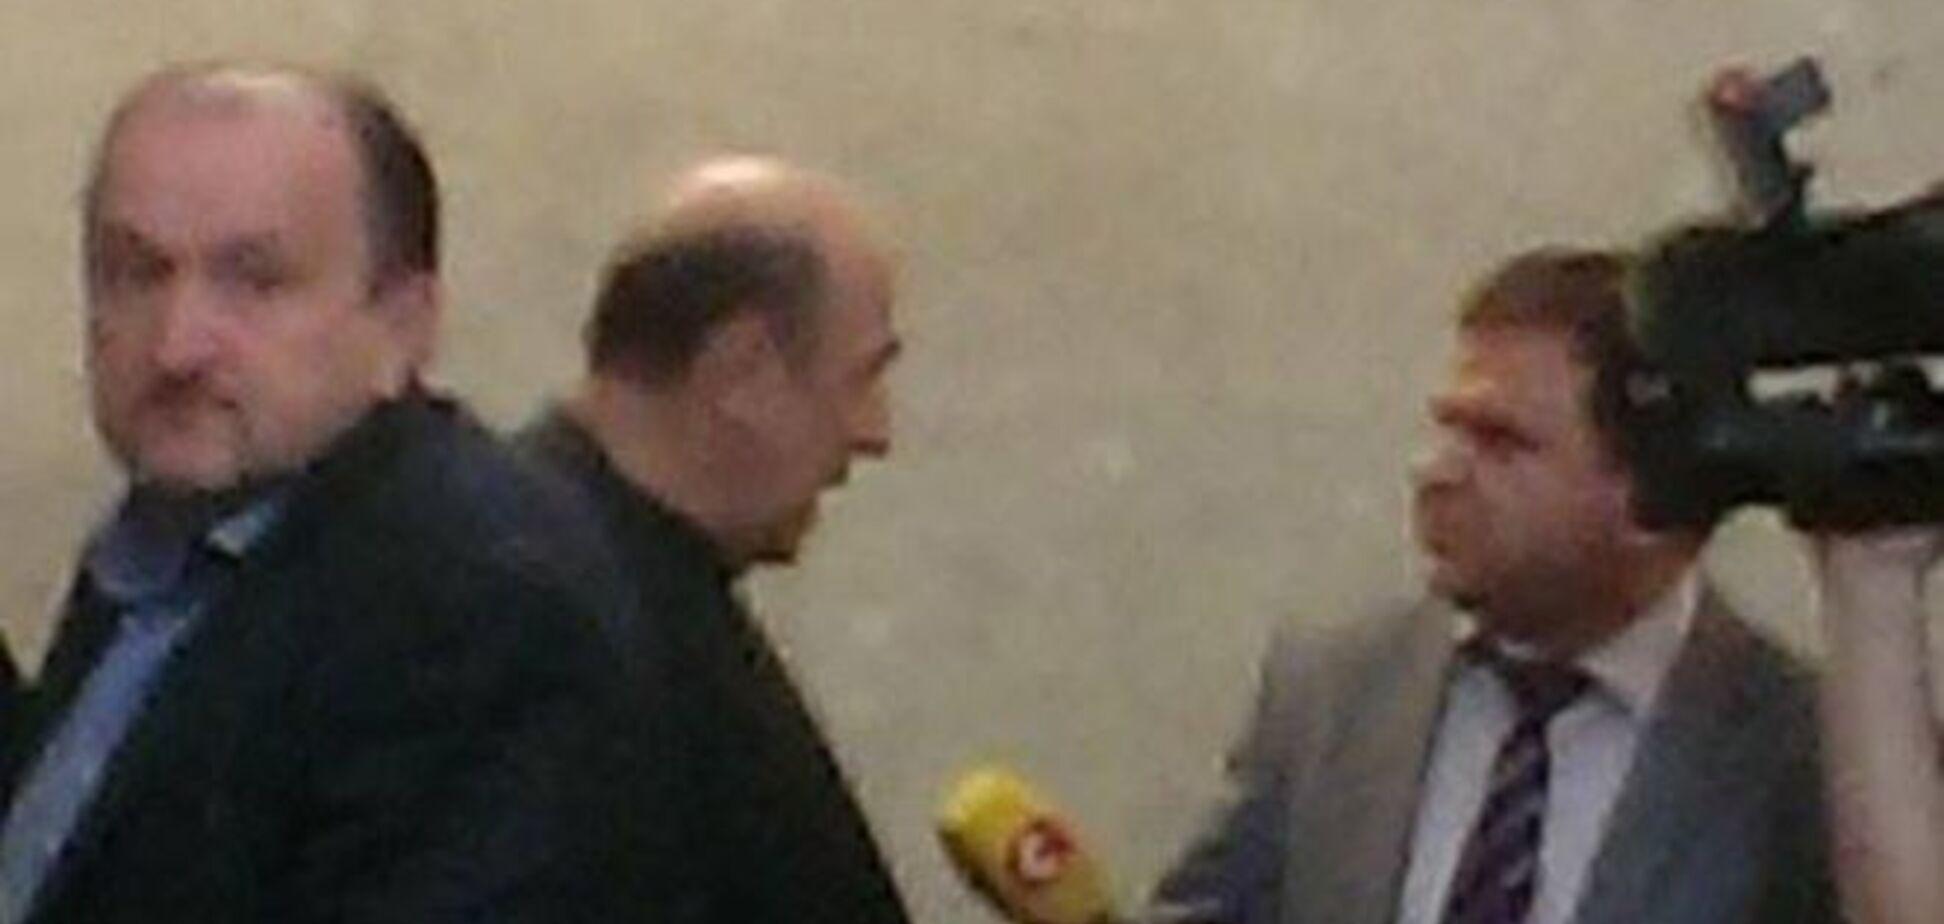 Суд идет: поддержать Фирташа прибыли Рабинович, Левочкина и Суркис: фотофакт